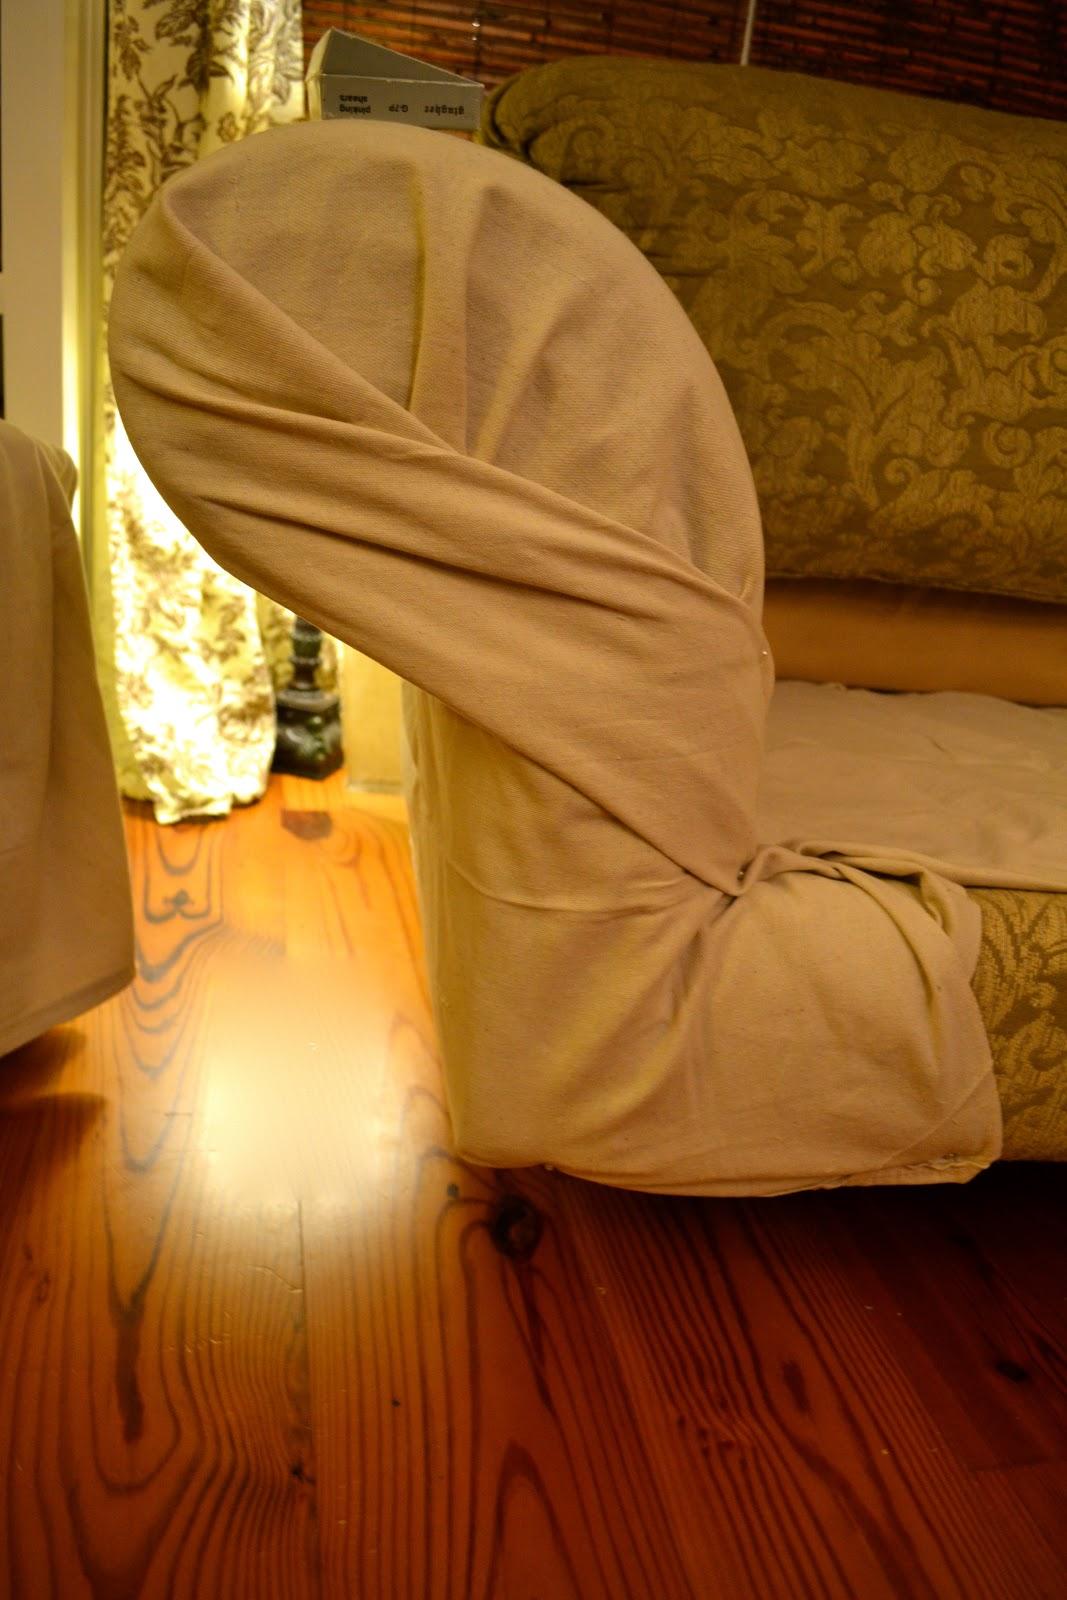 Diy Chair Slipcover No Sew Bedroom Table Set Ediblecreativity Tuck Pin Done Loveseat